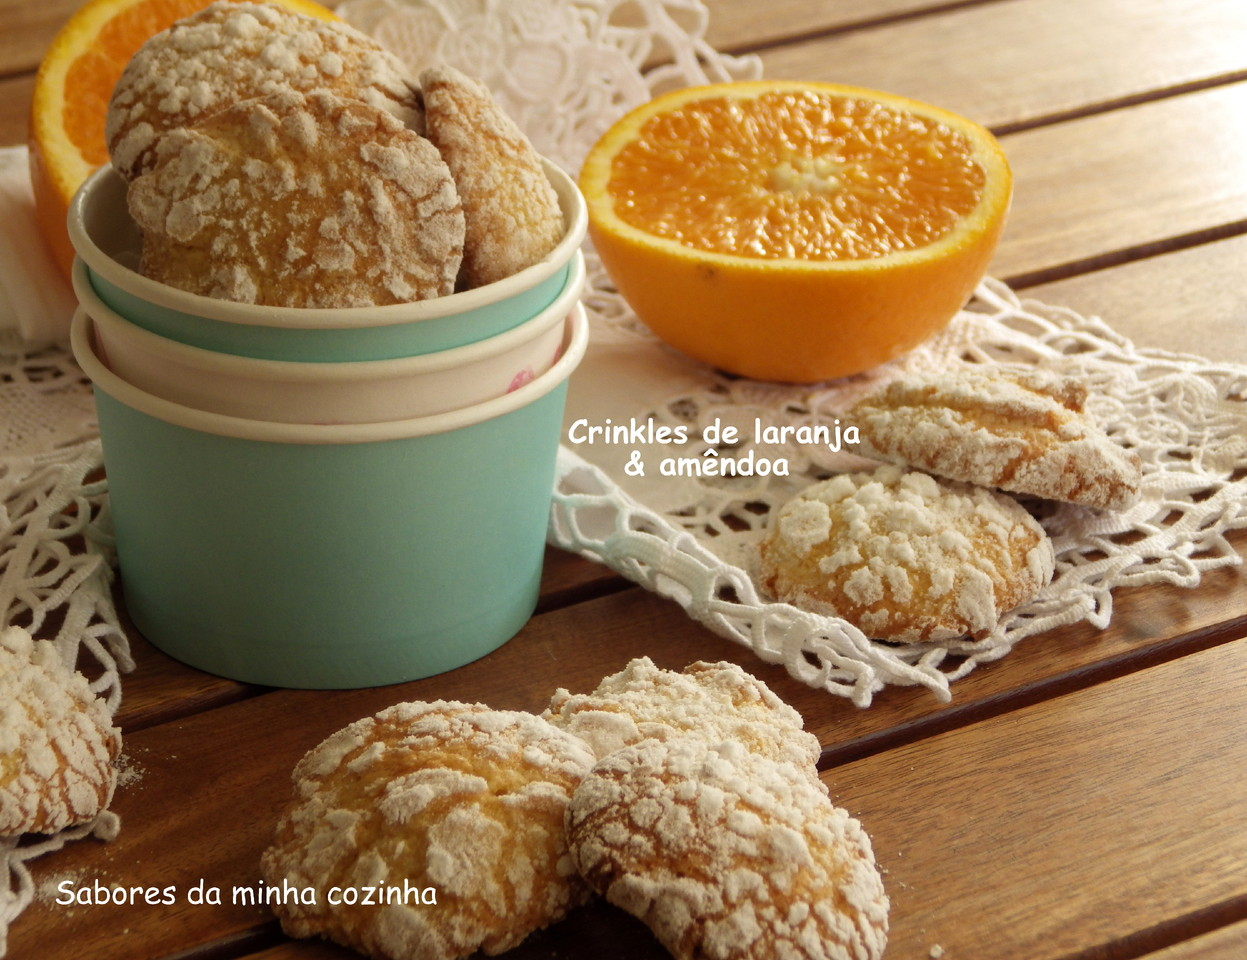 IMGP6317-Crinkles de laranja & amêndoa-Blog.JPG